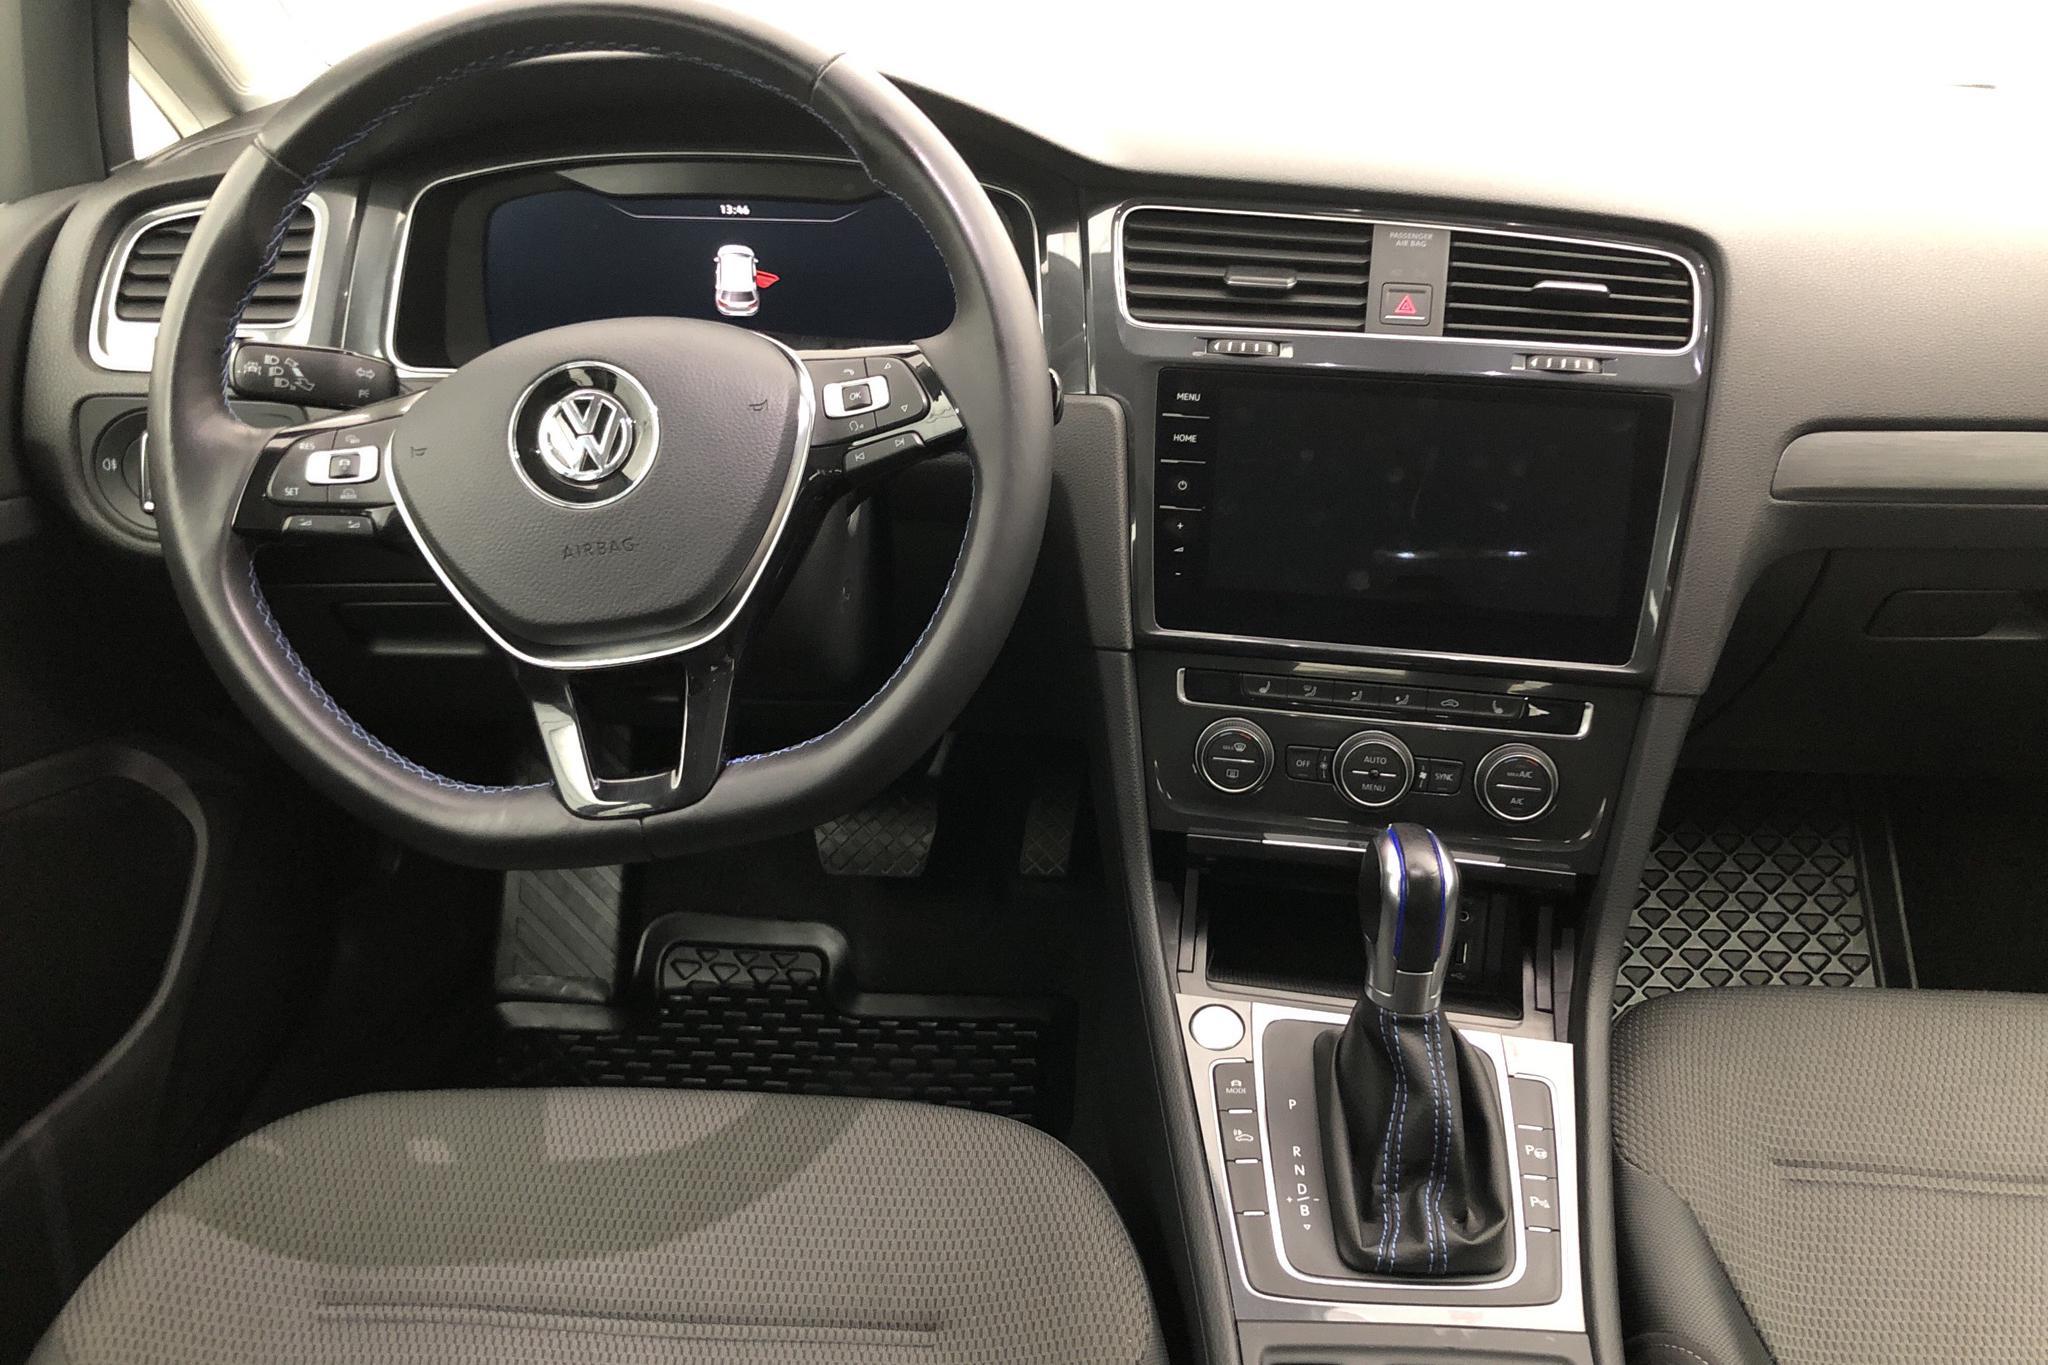 VW e-Golf VII 5dr (136hk) - 0 km - Automatic - Dark Grey - 2018